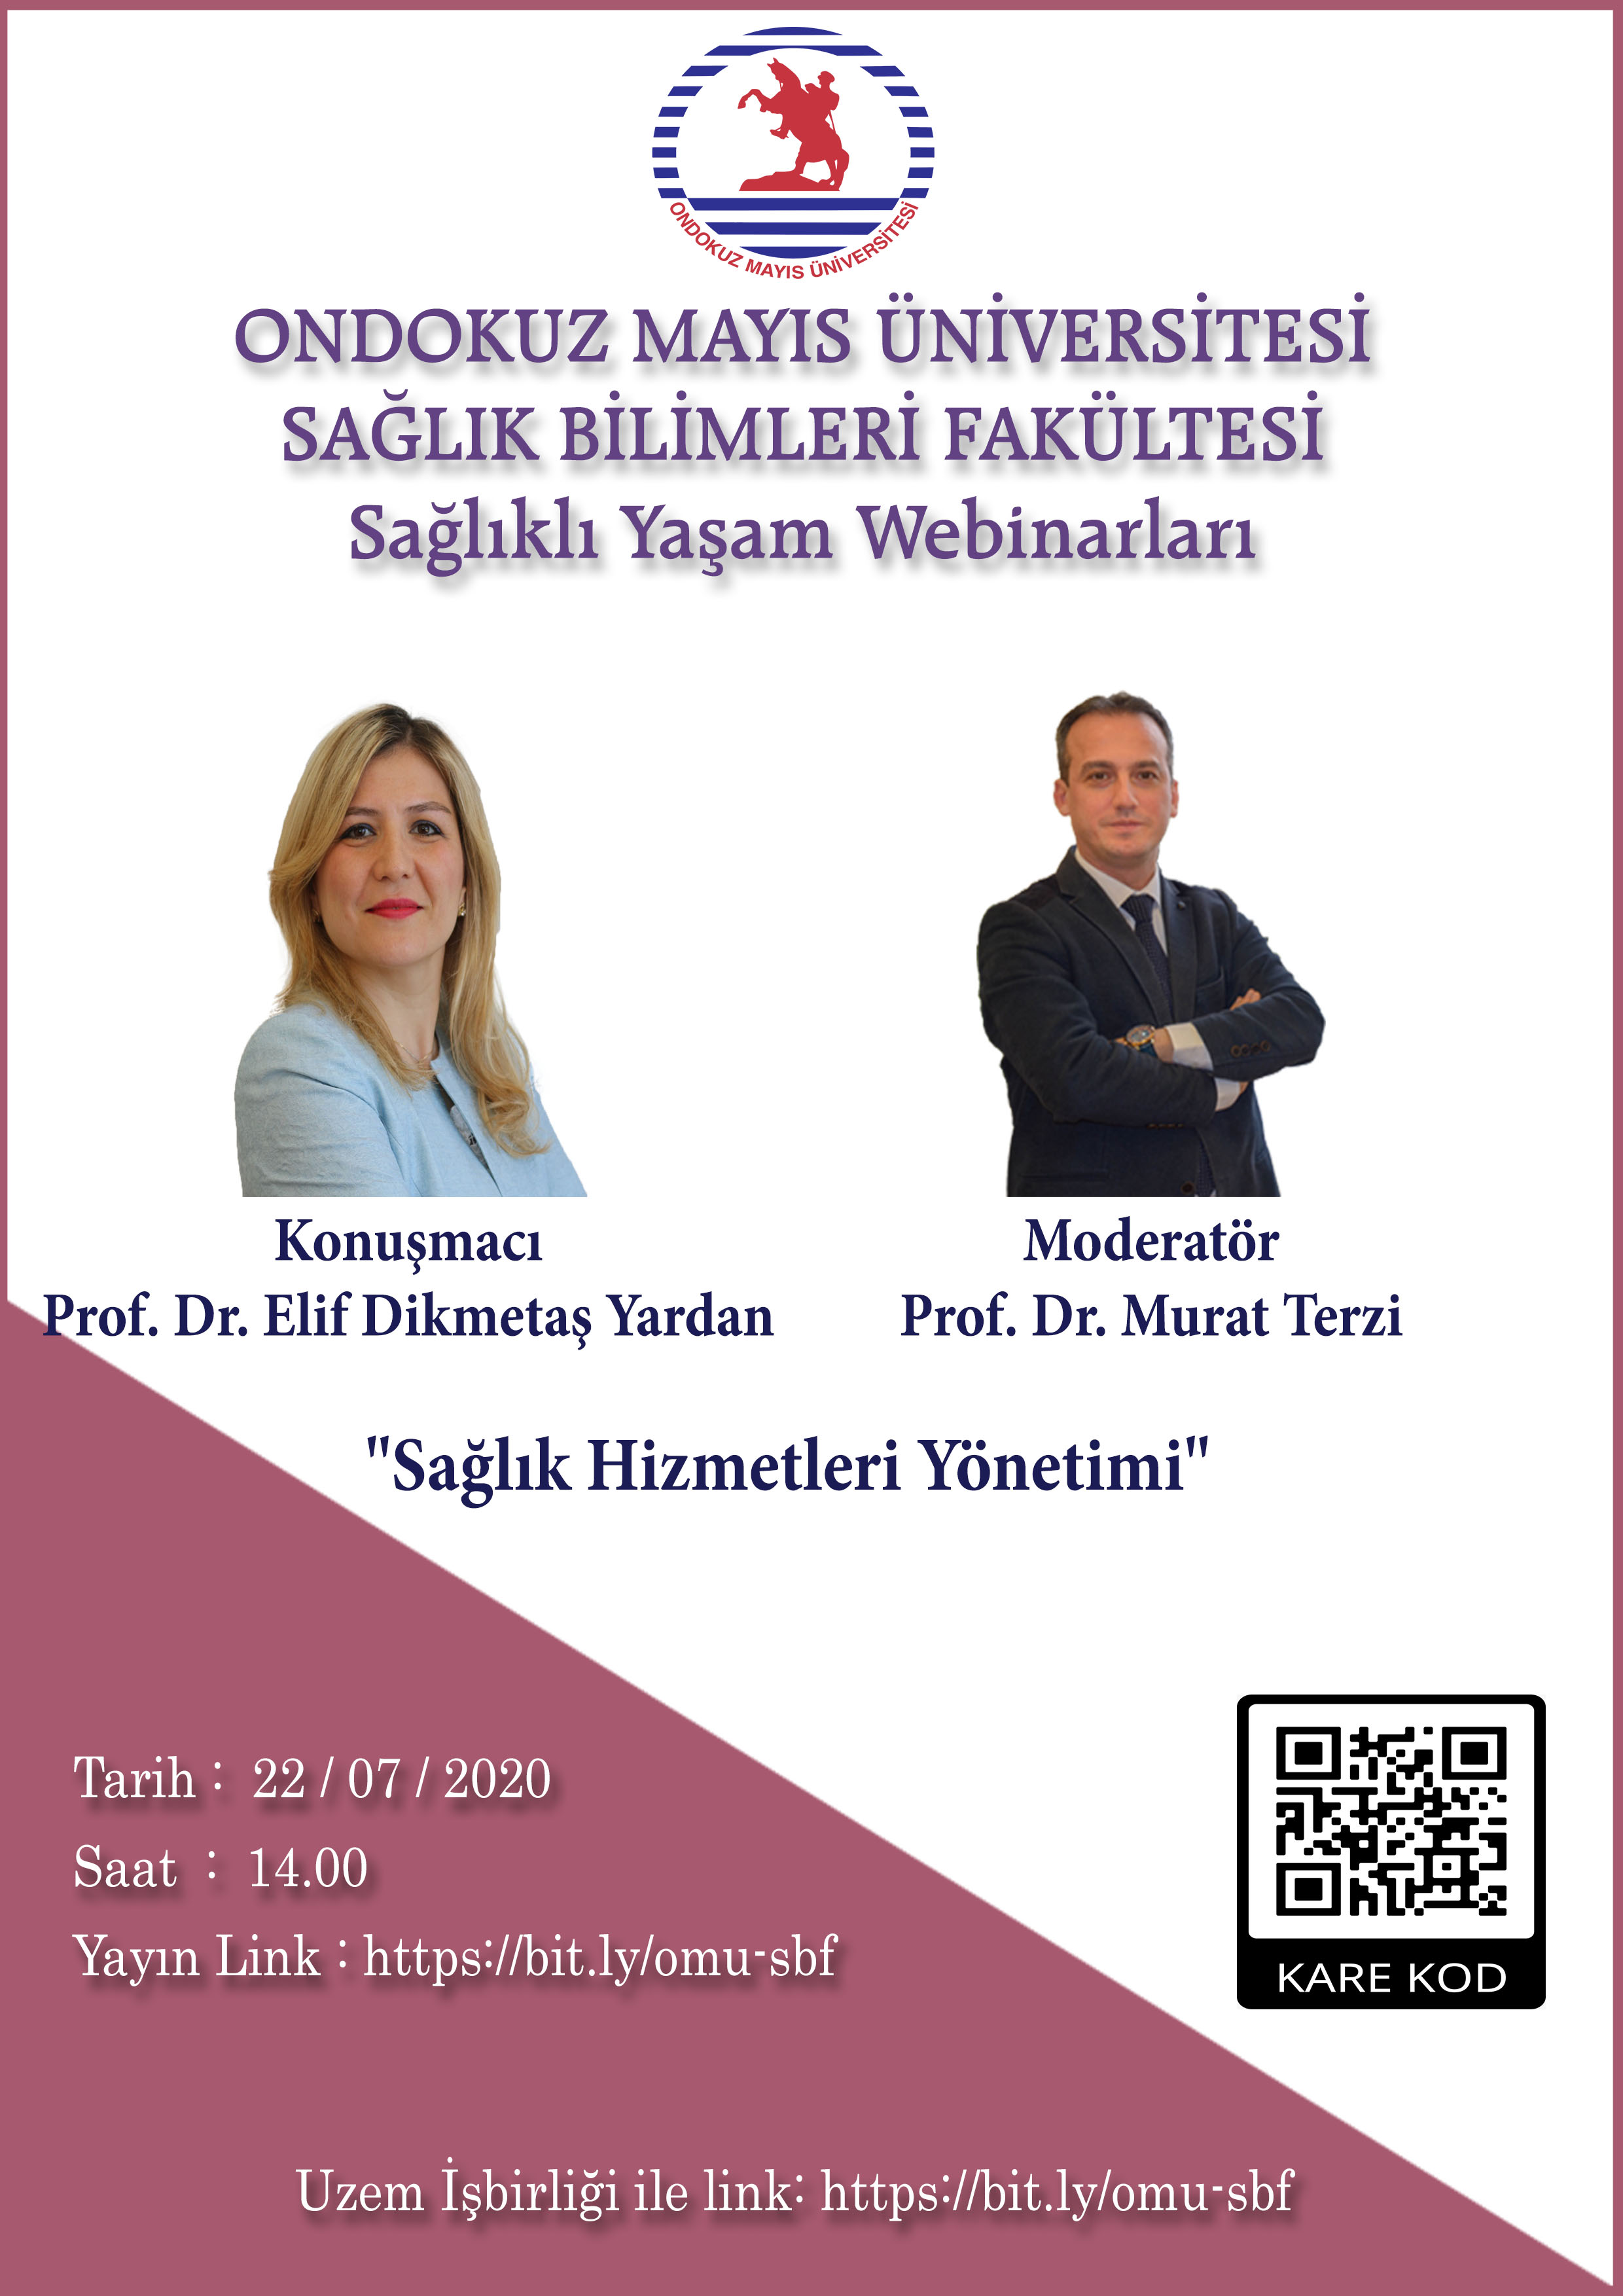 https://www.omu.edu.tr/sites/default/files/saglikli_yasam_webinarlari_-_3.jpg